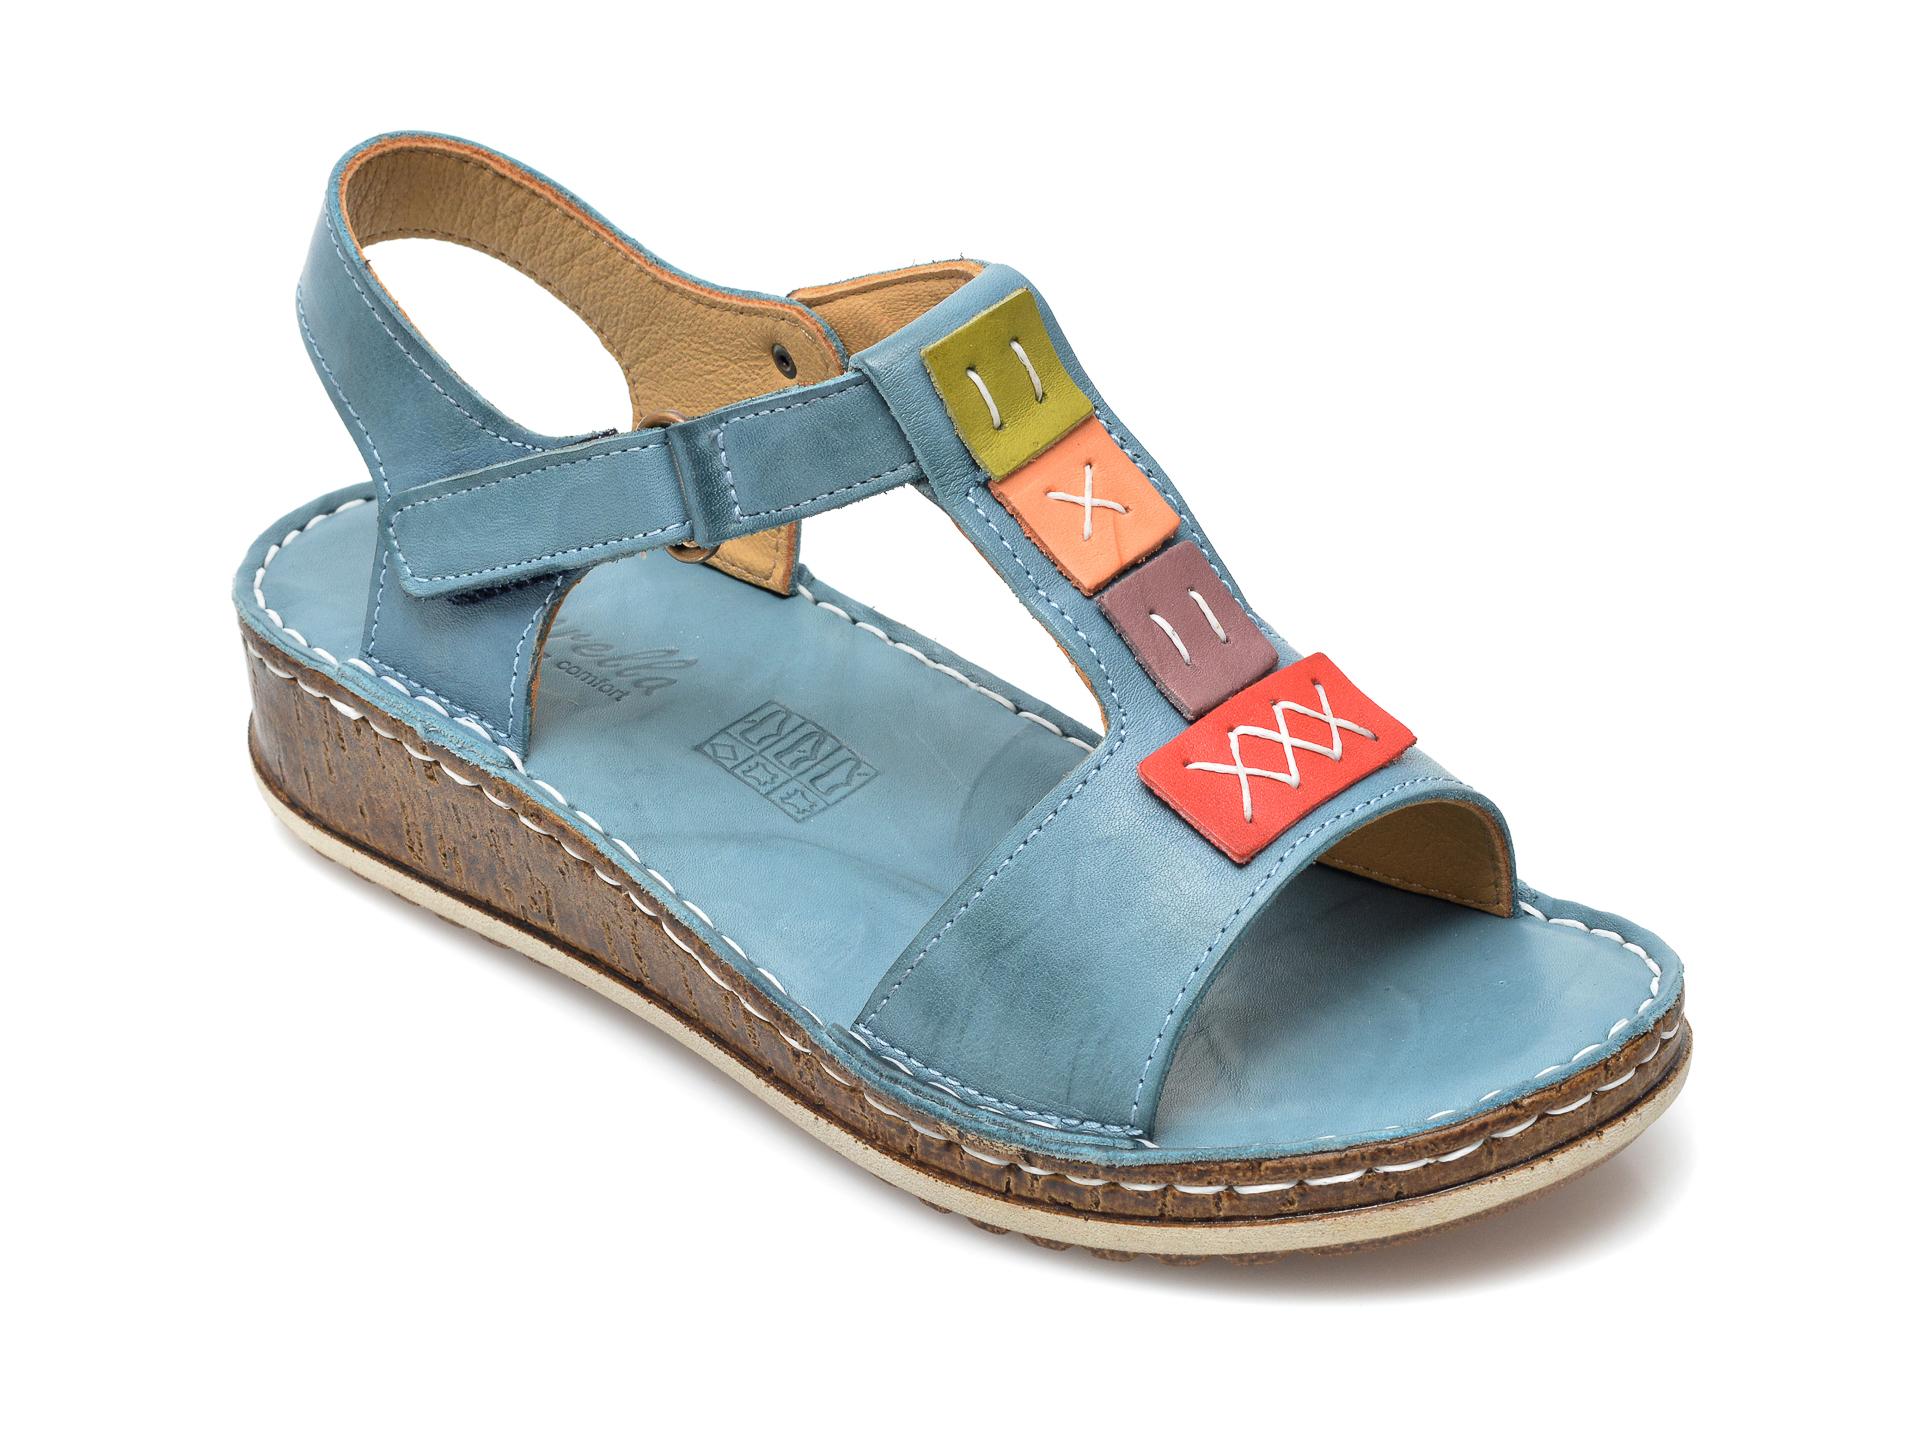 Sandale PAVARELLA albastre, 1341, din piele naturala imagine otter.ro 2021